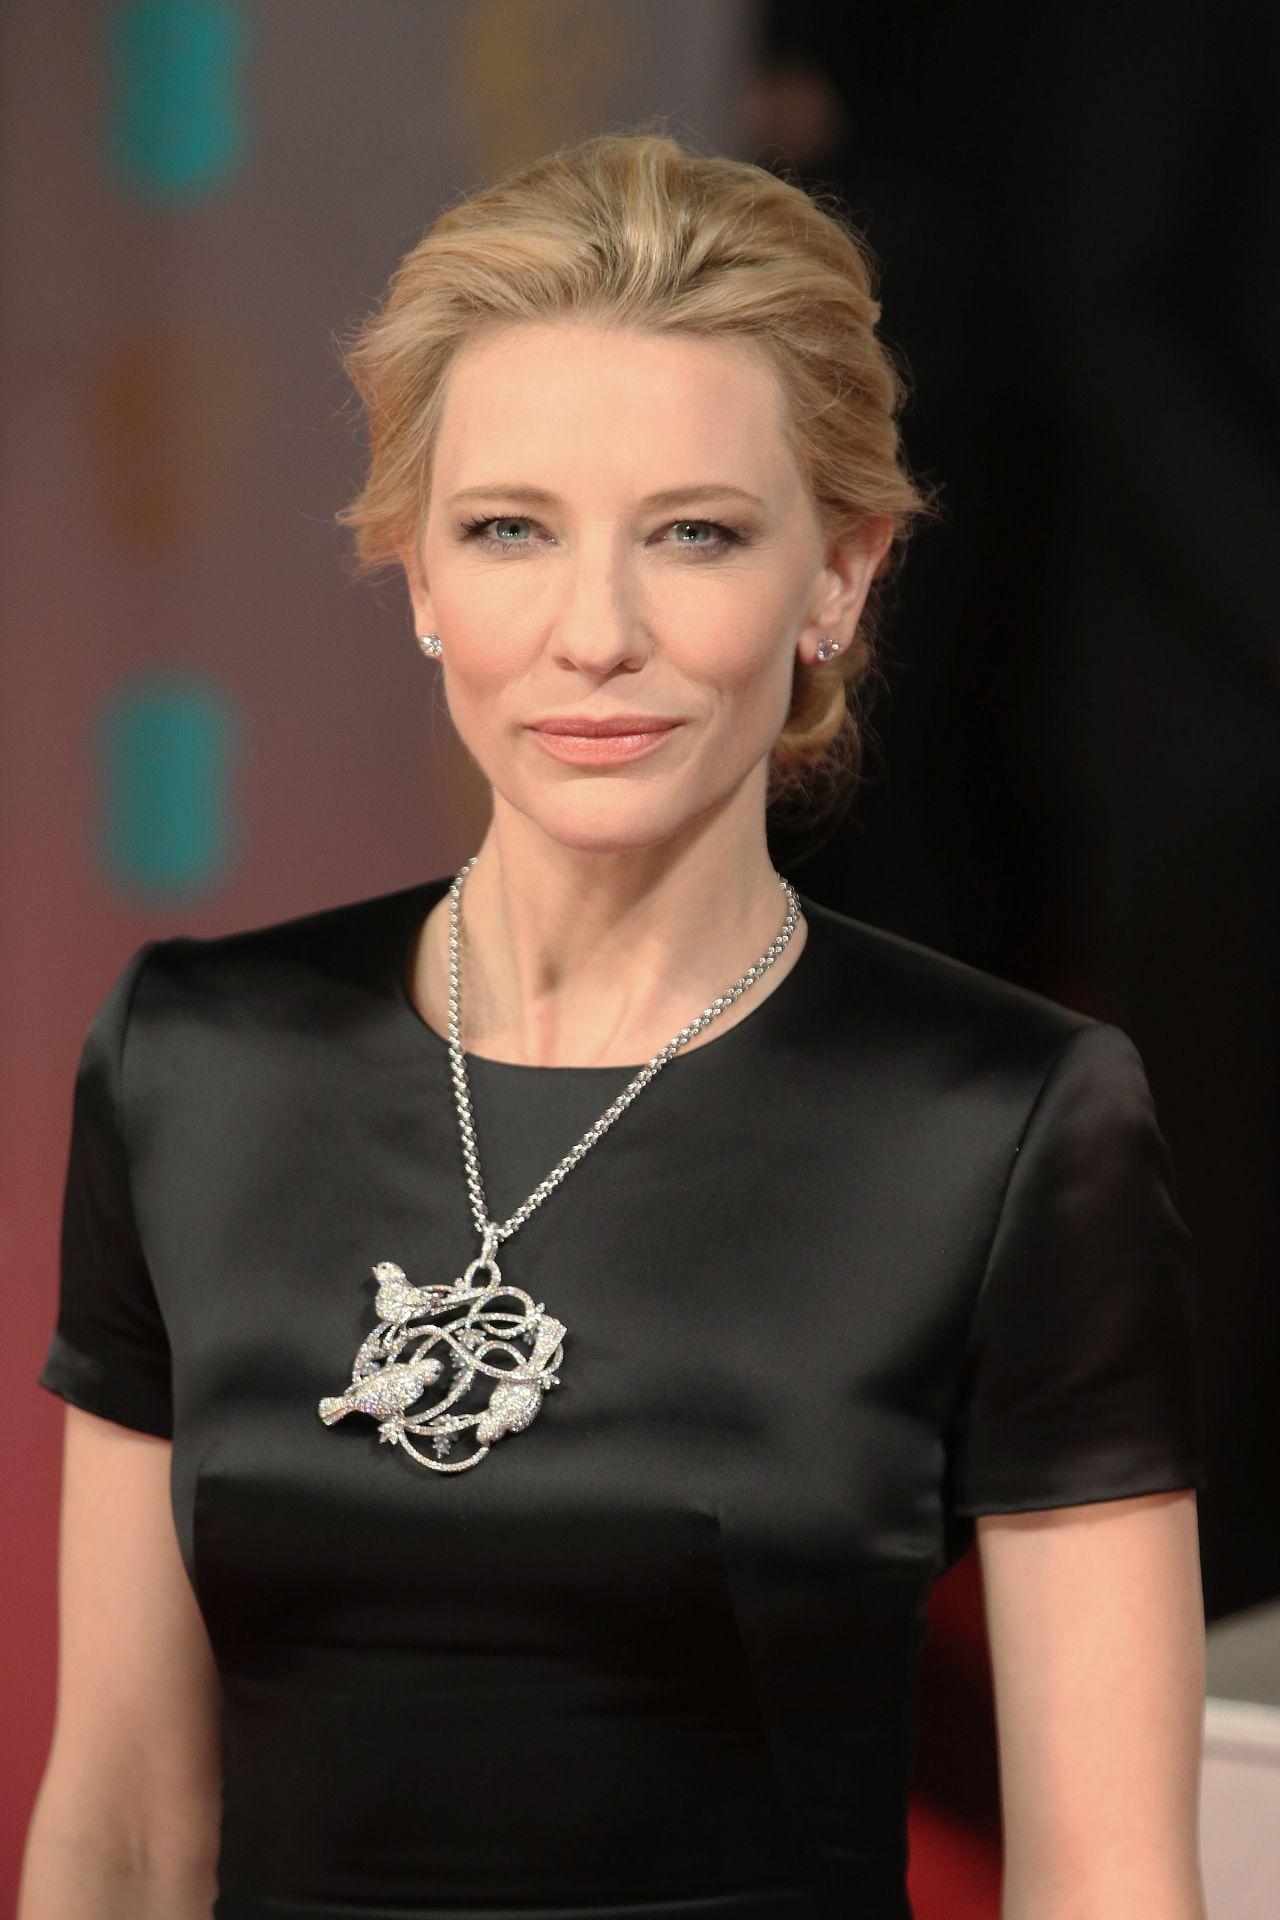 Cate Blanchett Wearing Alexander Mcqueen 2014 Bafta Awards